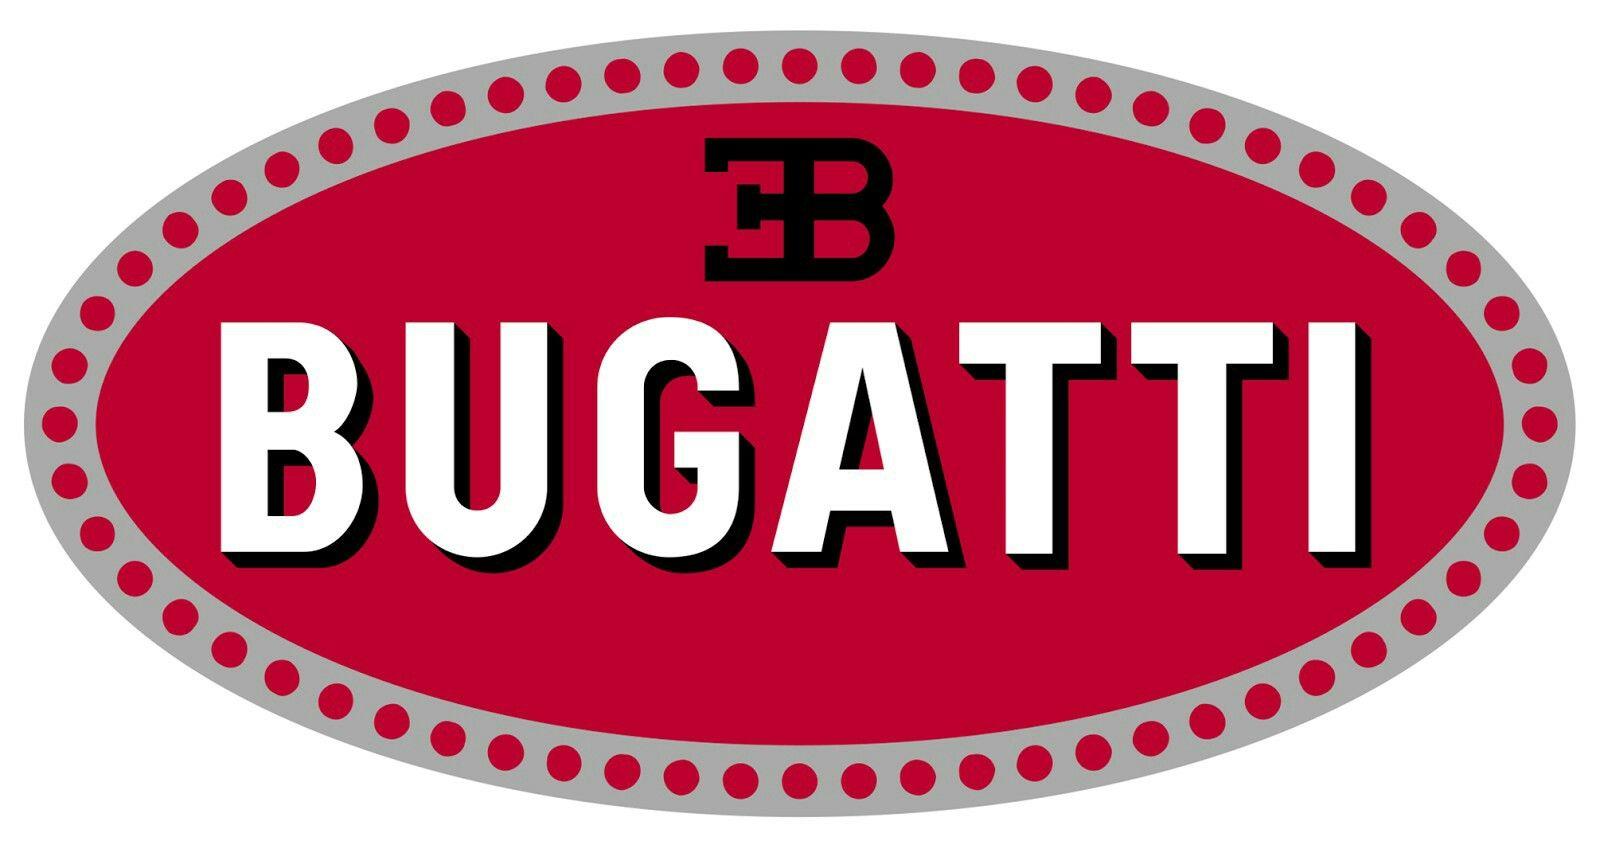 Bugatti logo bugatti car symbol meaning and history car brand bugatti logo bugatti car symbol meaning and history car brand biocorpaavc Choice Image